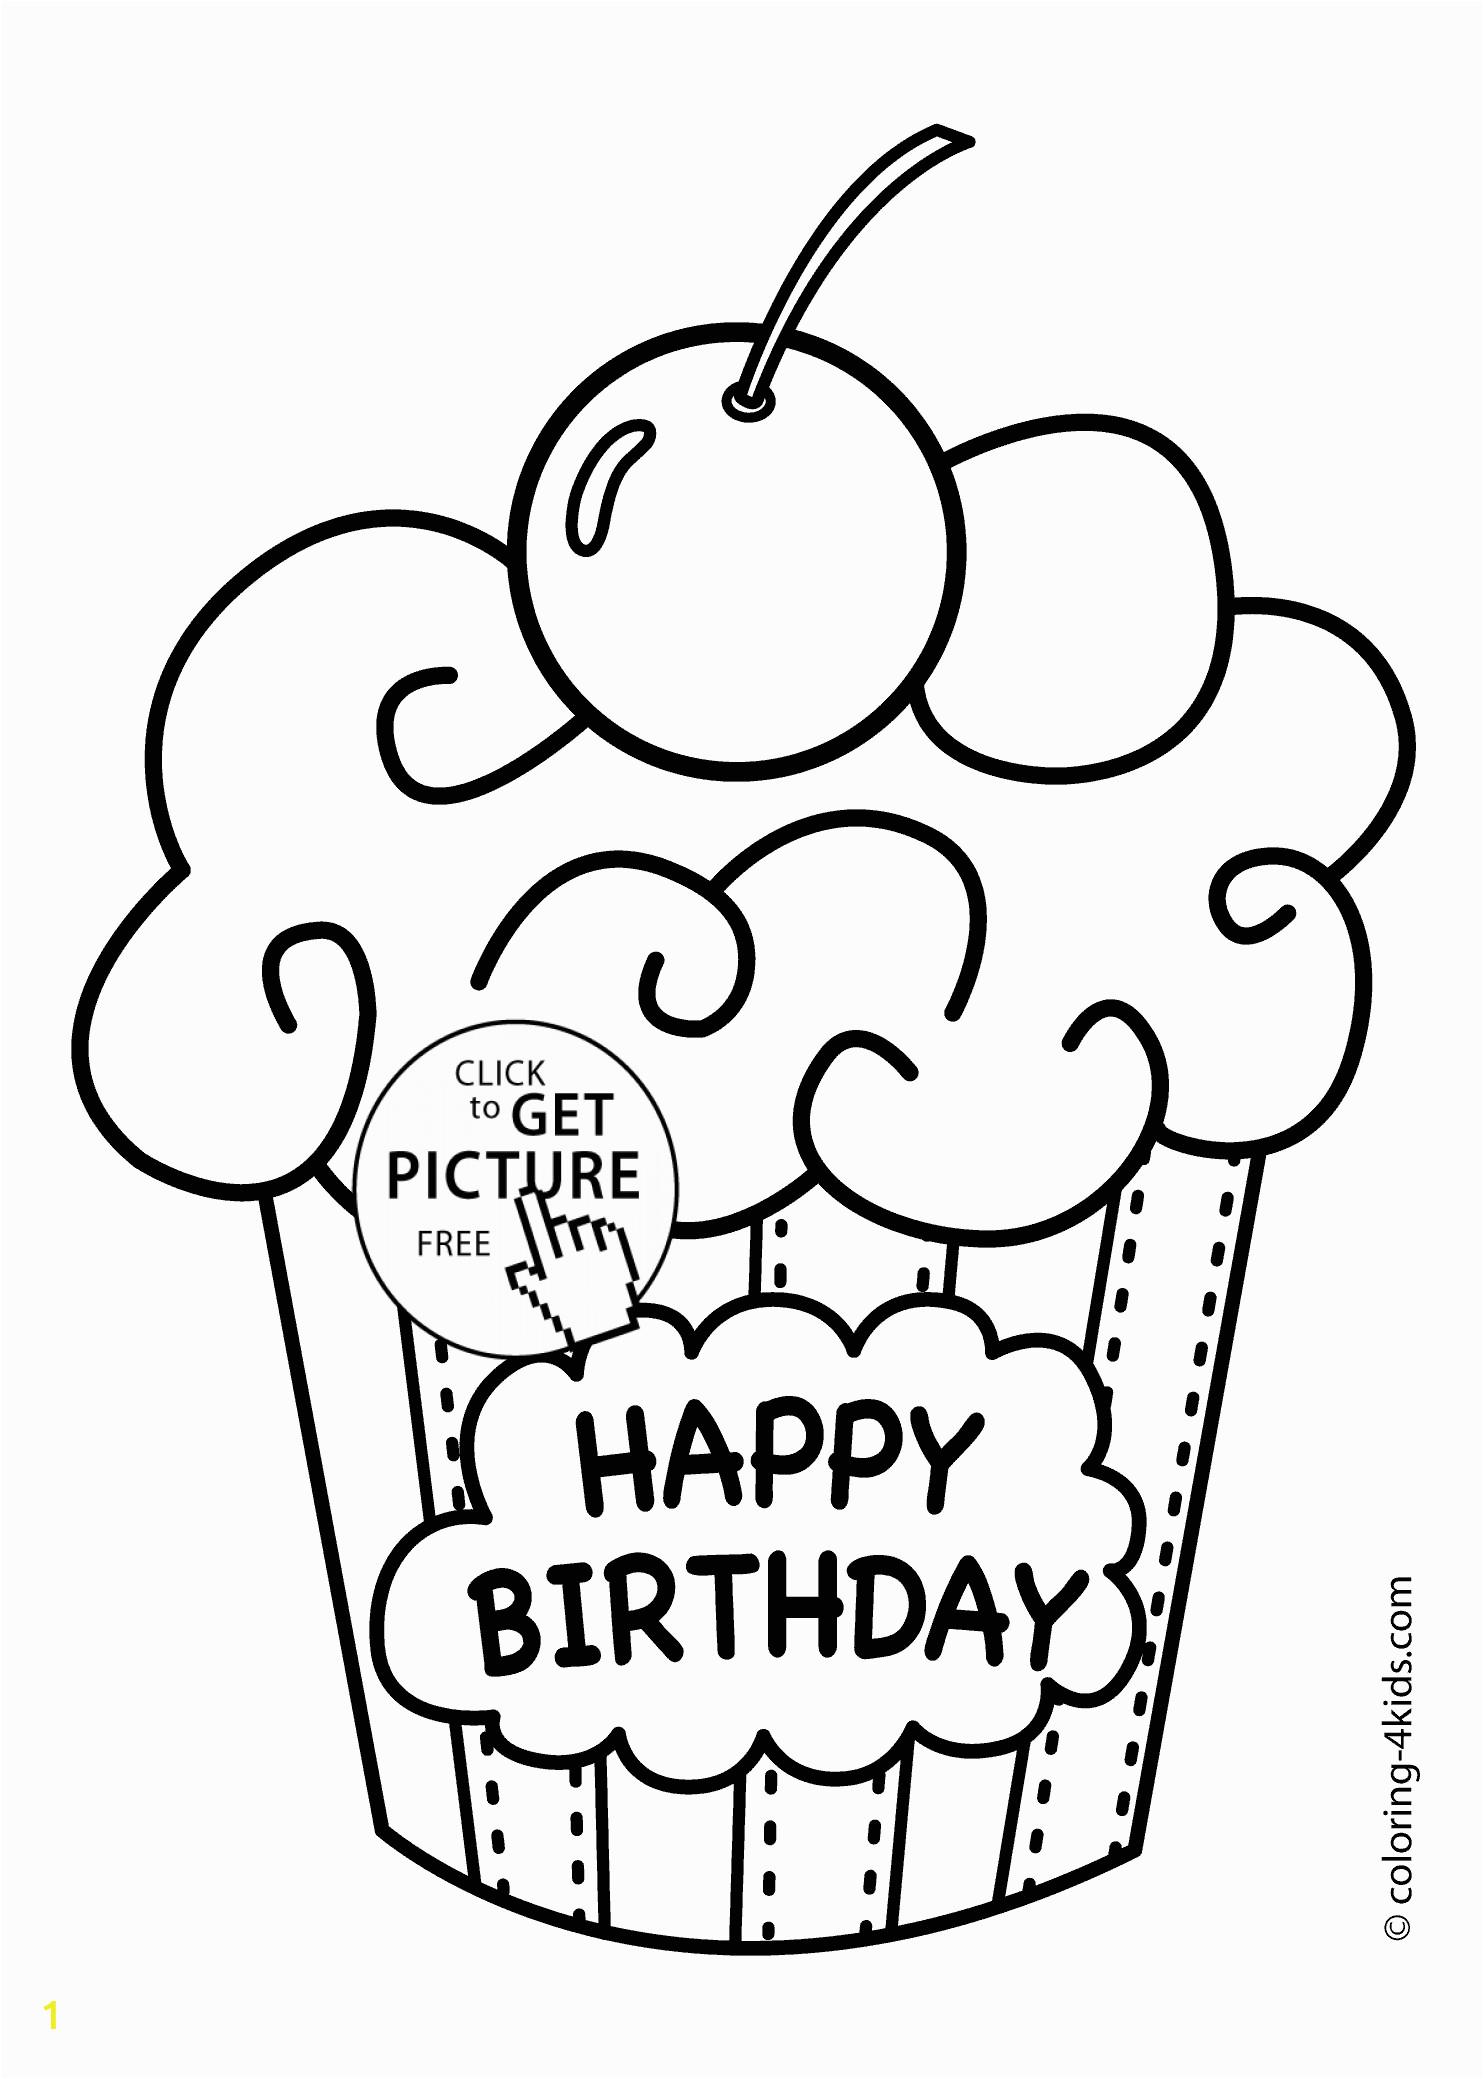 8f57aceb6e4c4935d3c4e89be4edb8b5 birthday coloring pages for kids birthday party coloring pages 1483 2079